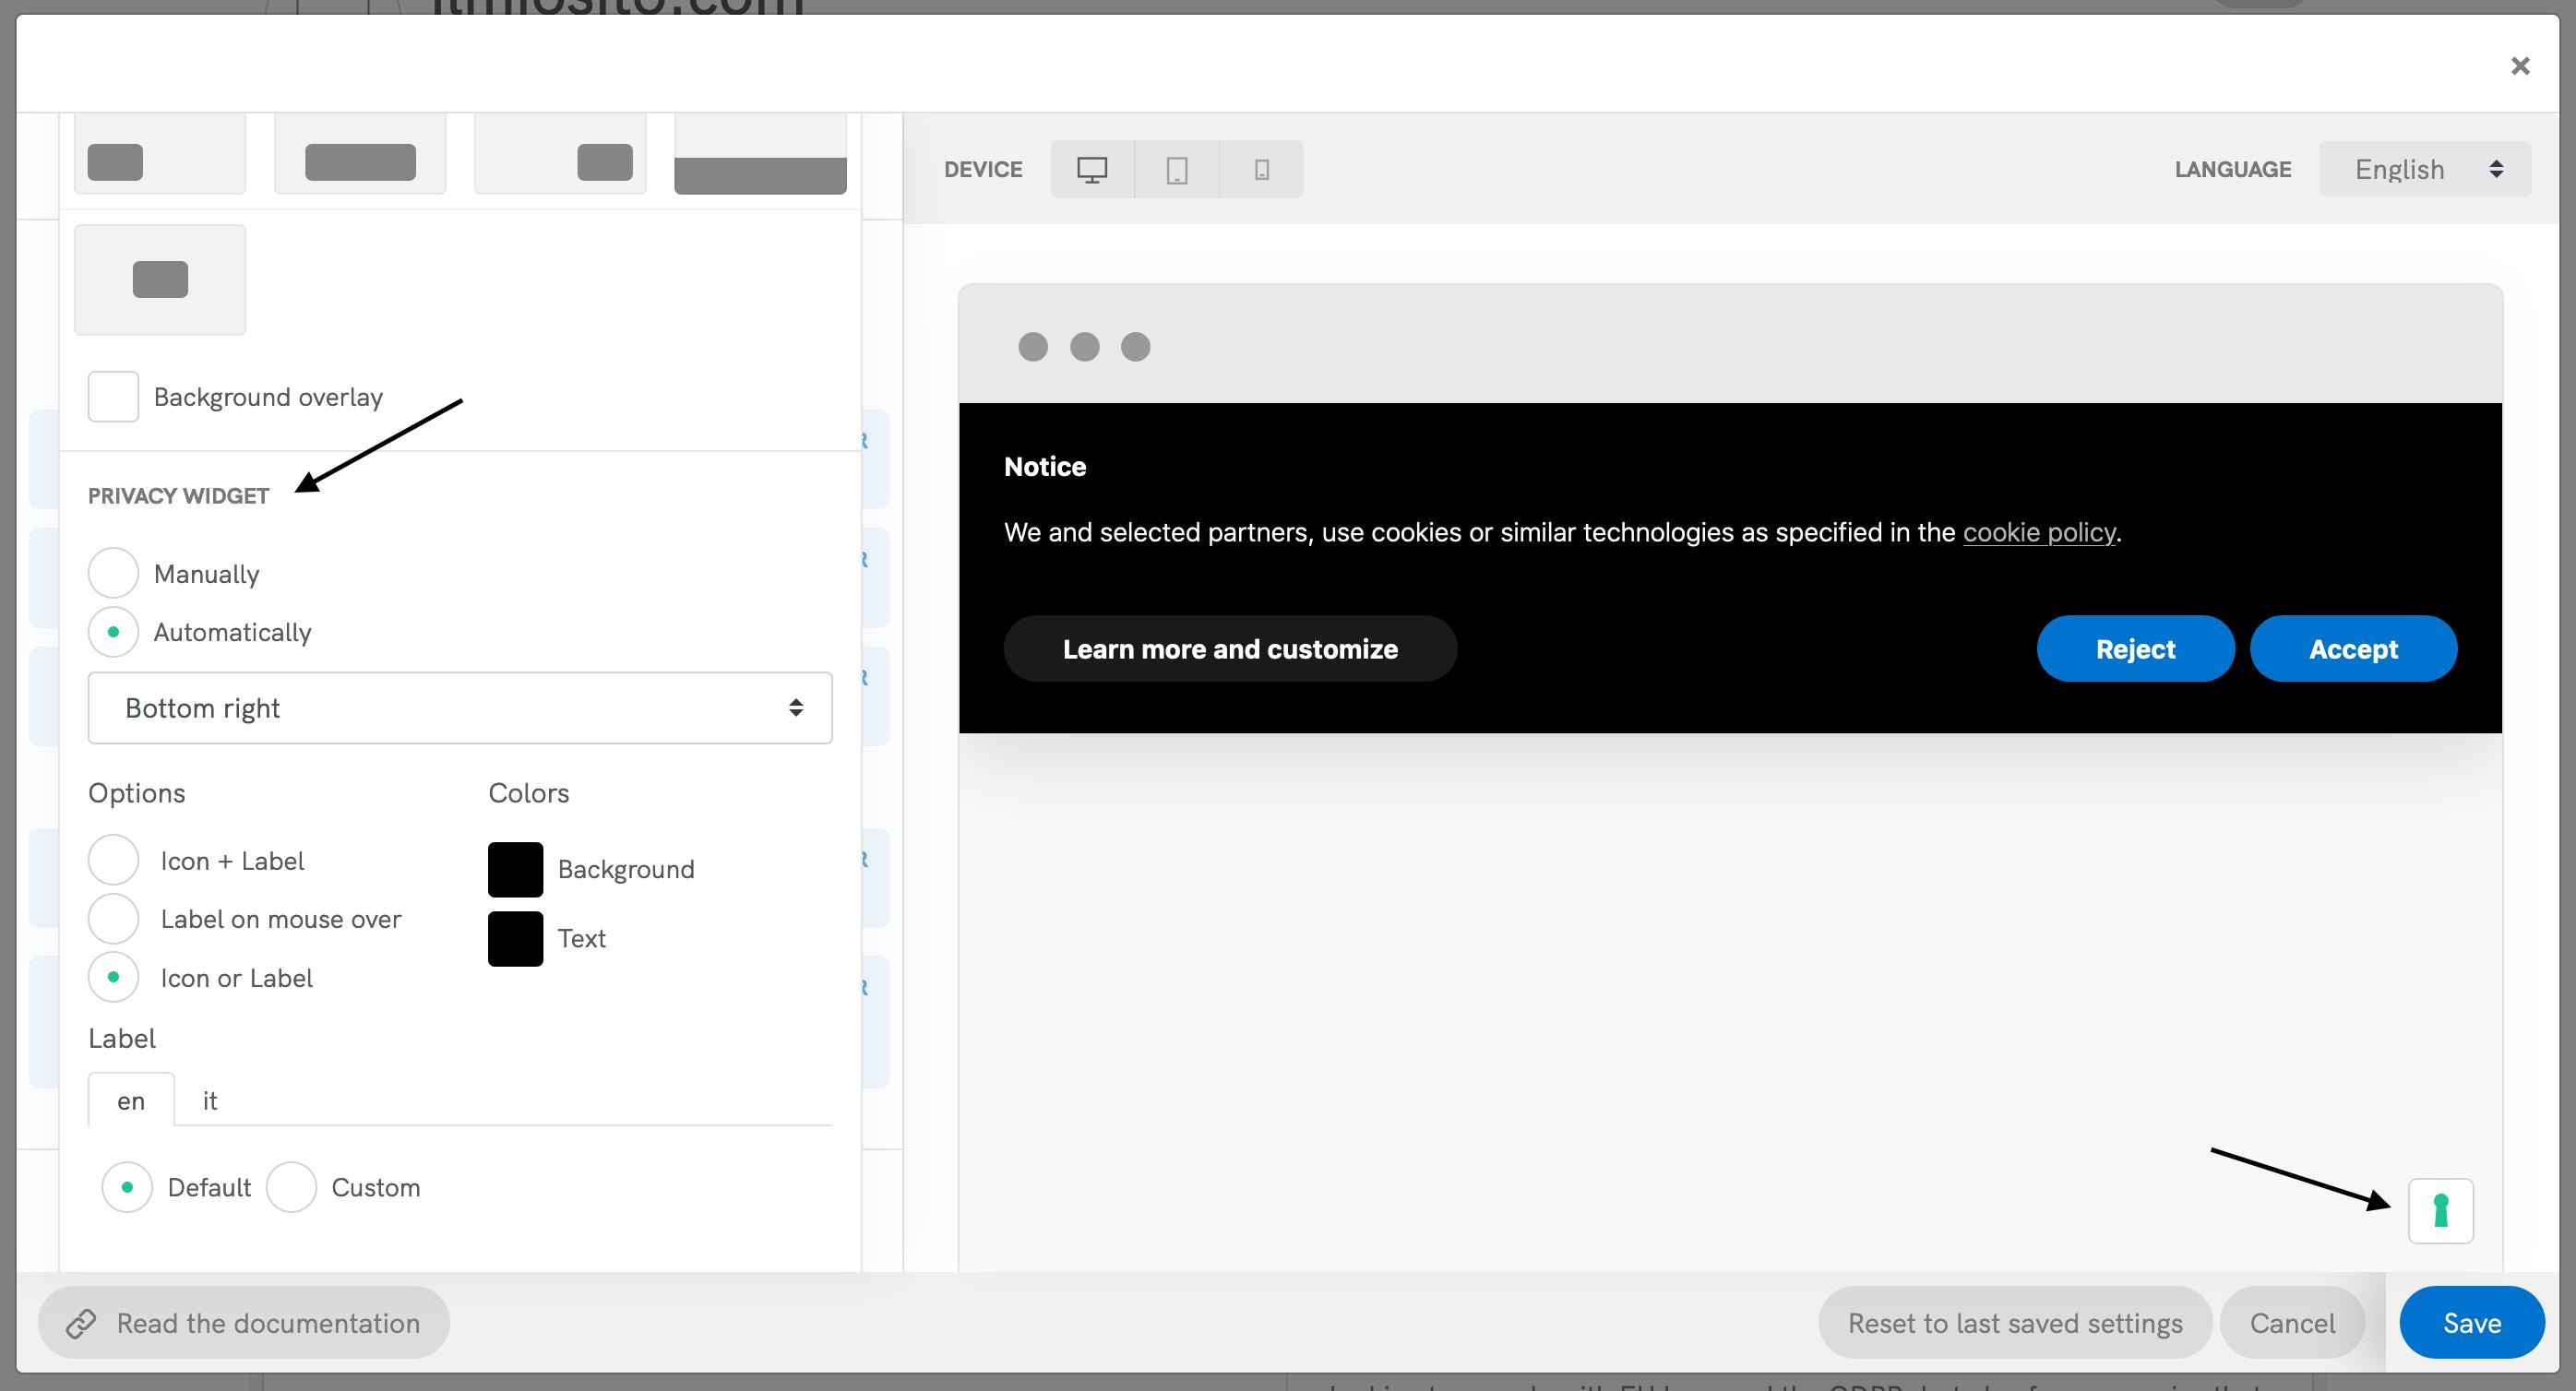 Cookie Solution configurator - Privacy widget